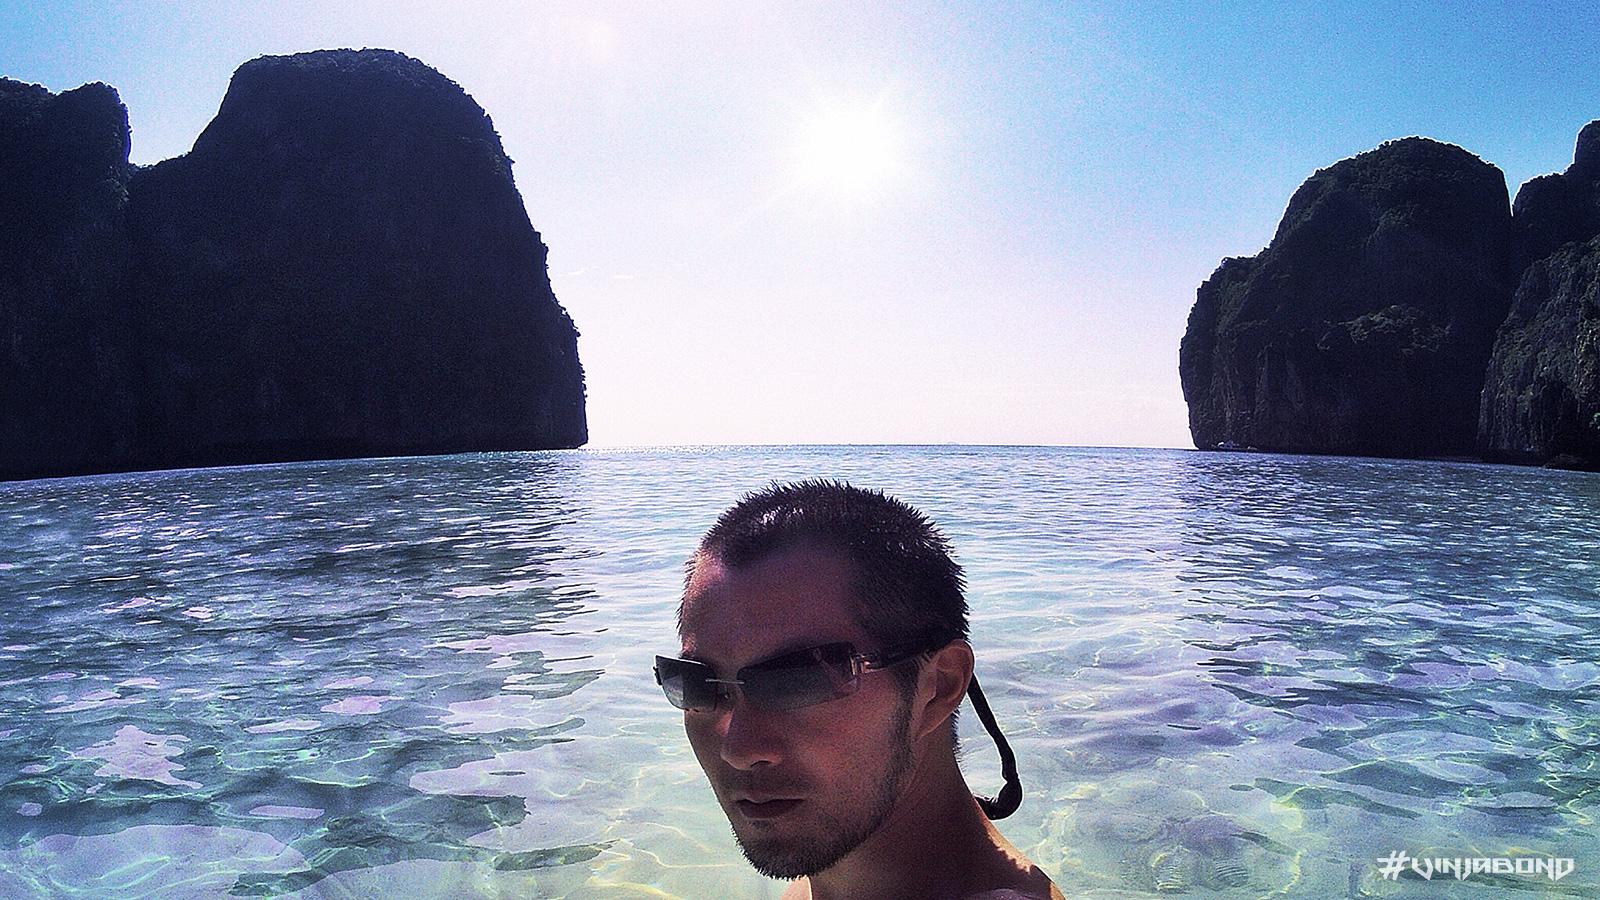 Maya Bay Beach of Koh Phi Phi in Thailand /// Vinjabond